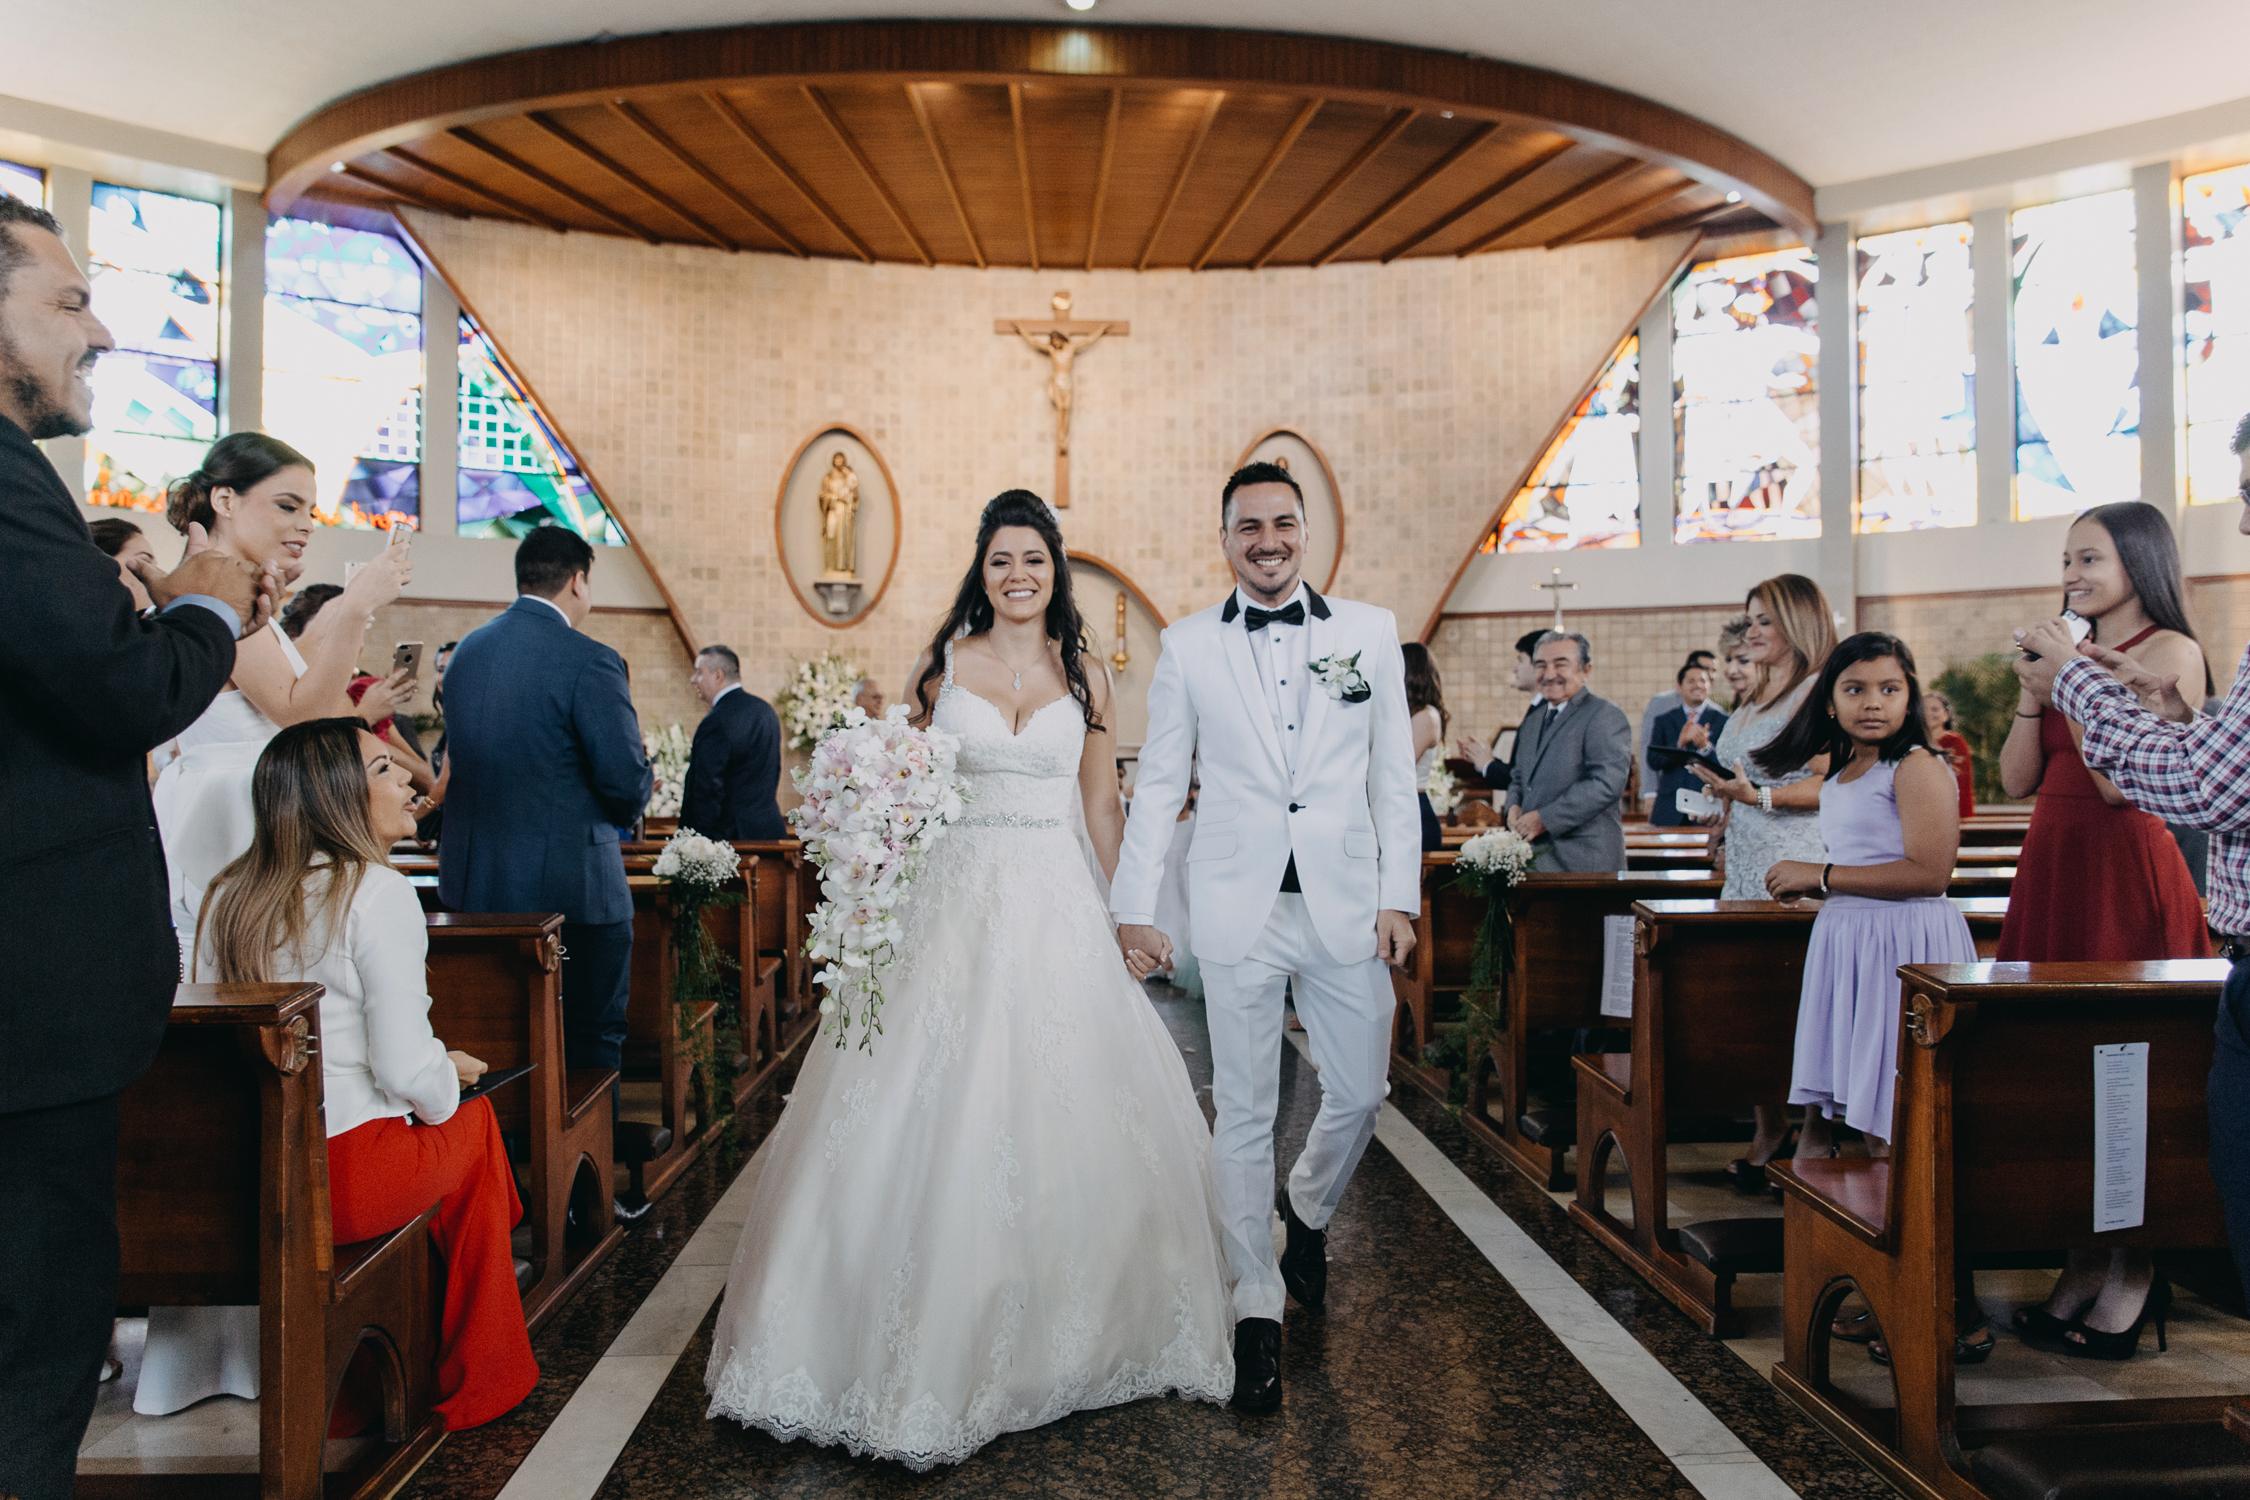 Michelle-Agurto-Fotografia-Bodas-Ecuador-Destination-Wedding-Photographer-Daniela-Dirk-18.JPG